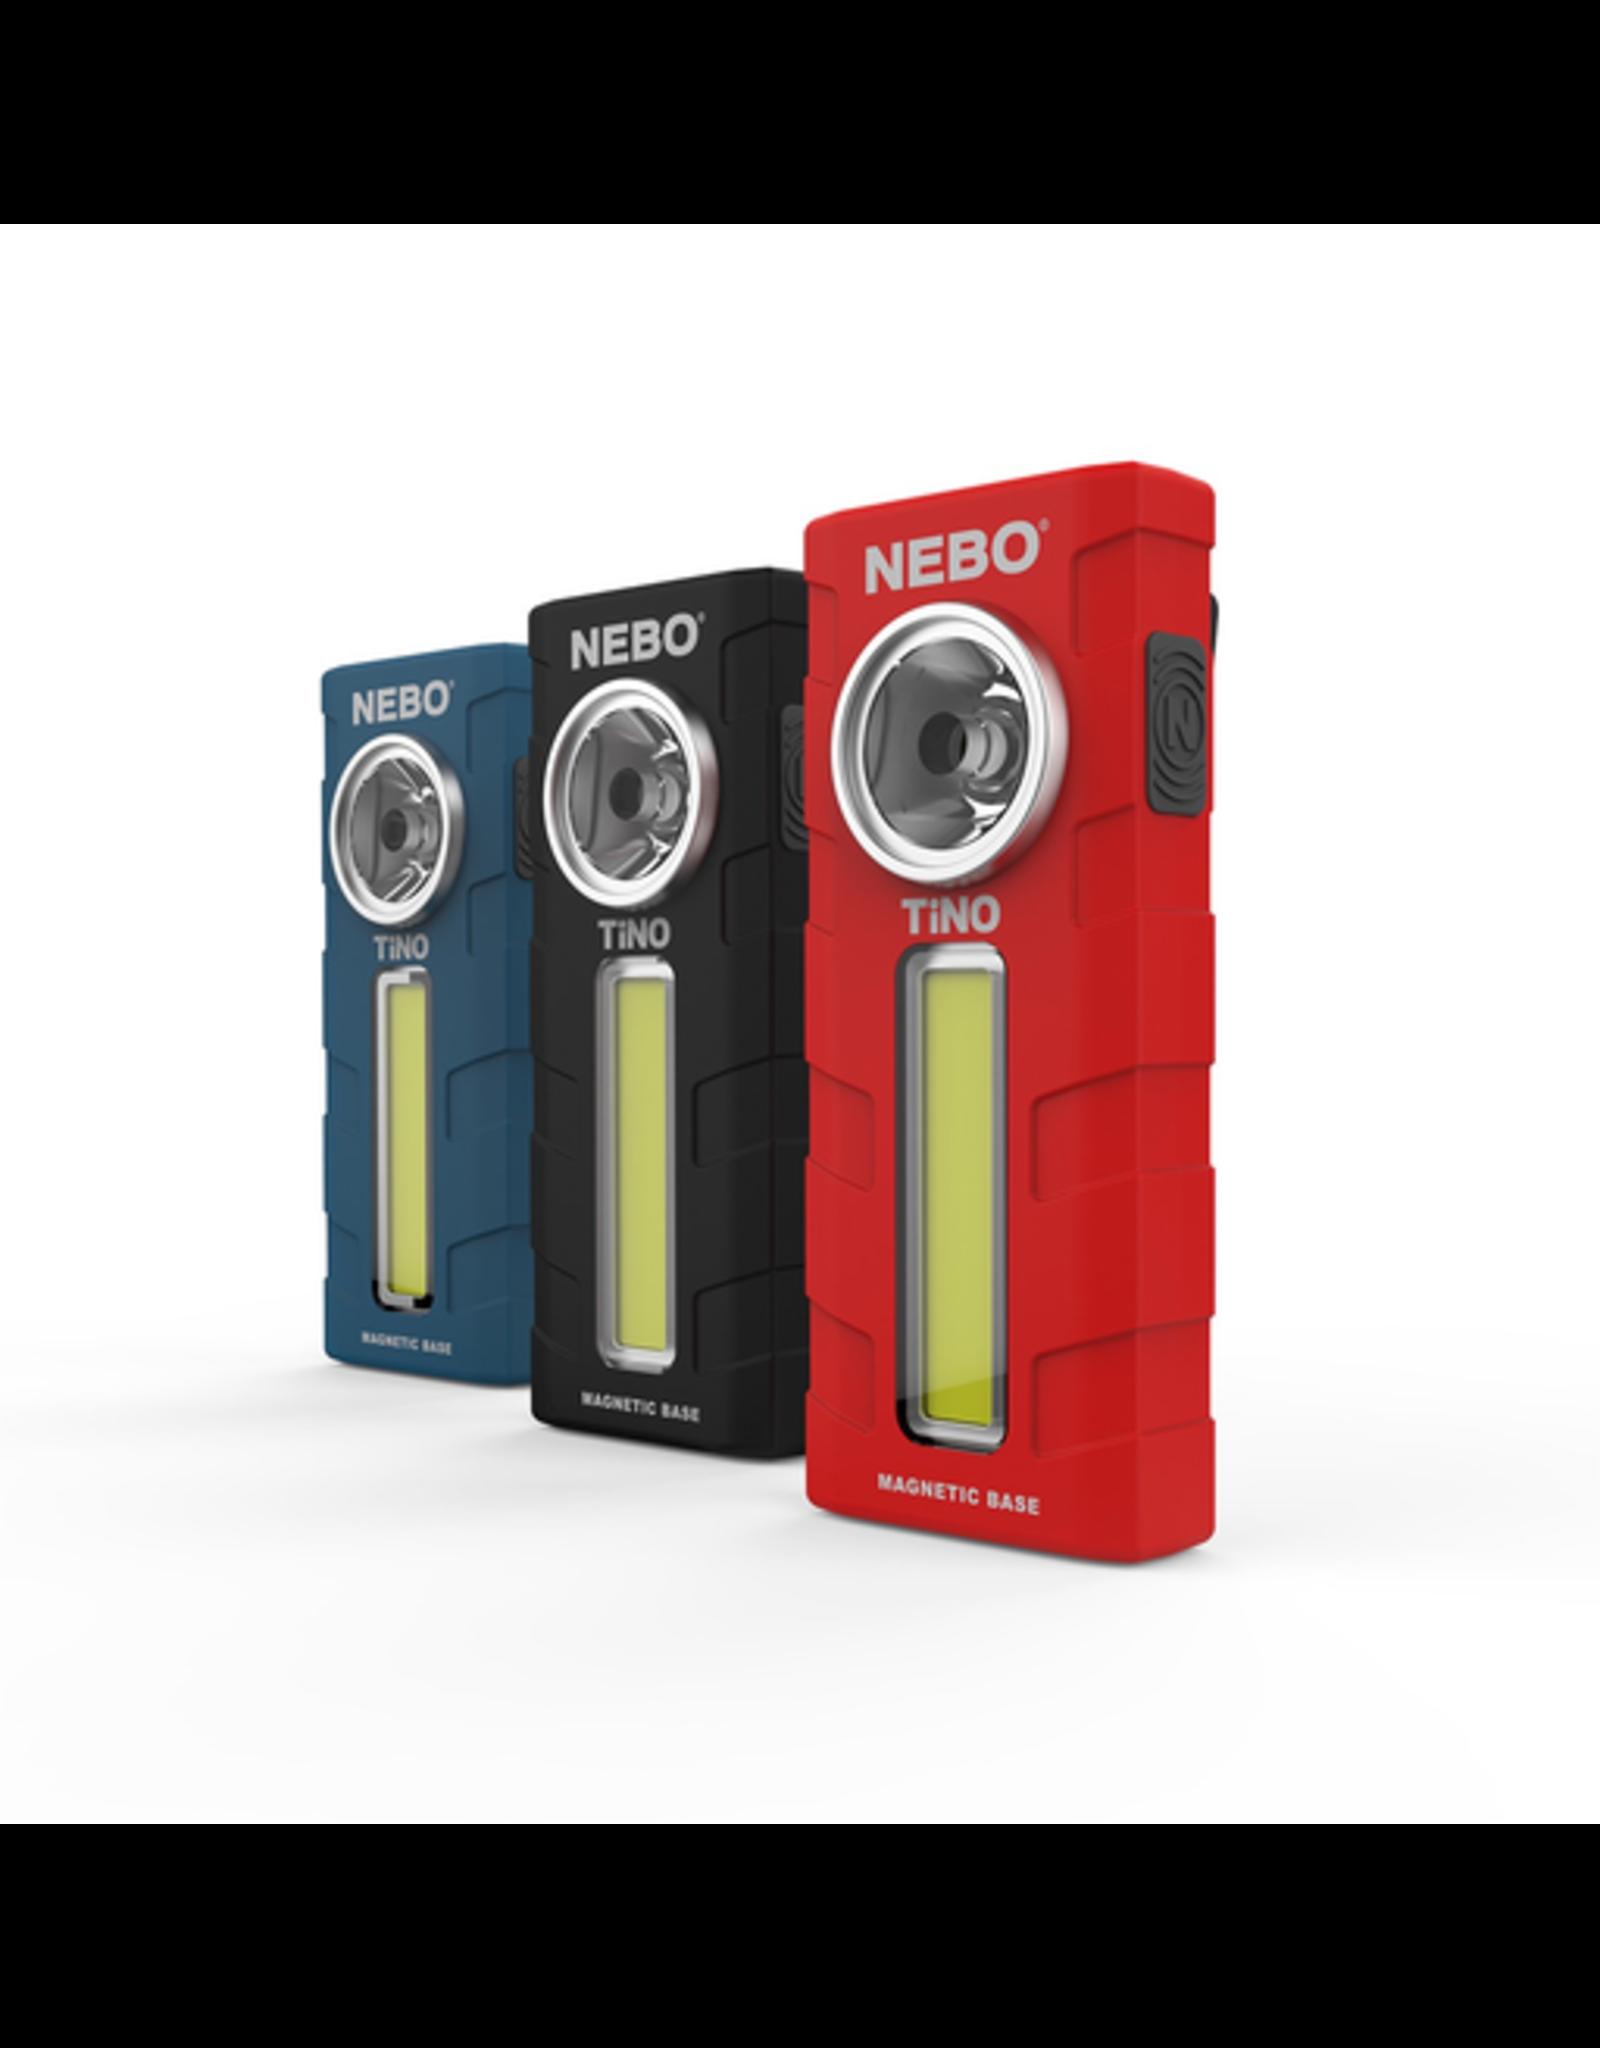 Nebo NEBO, TiNO 300 Lumen Pocket Light